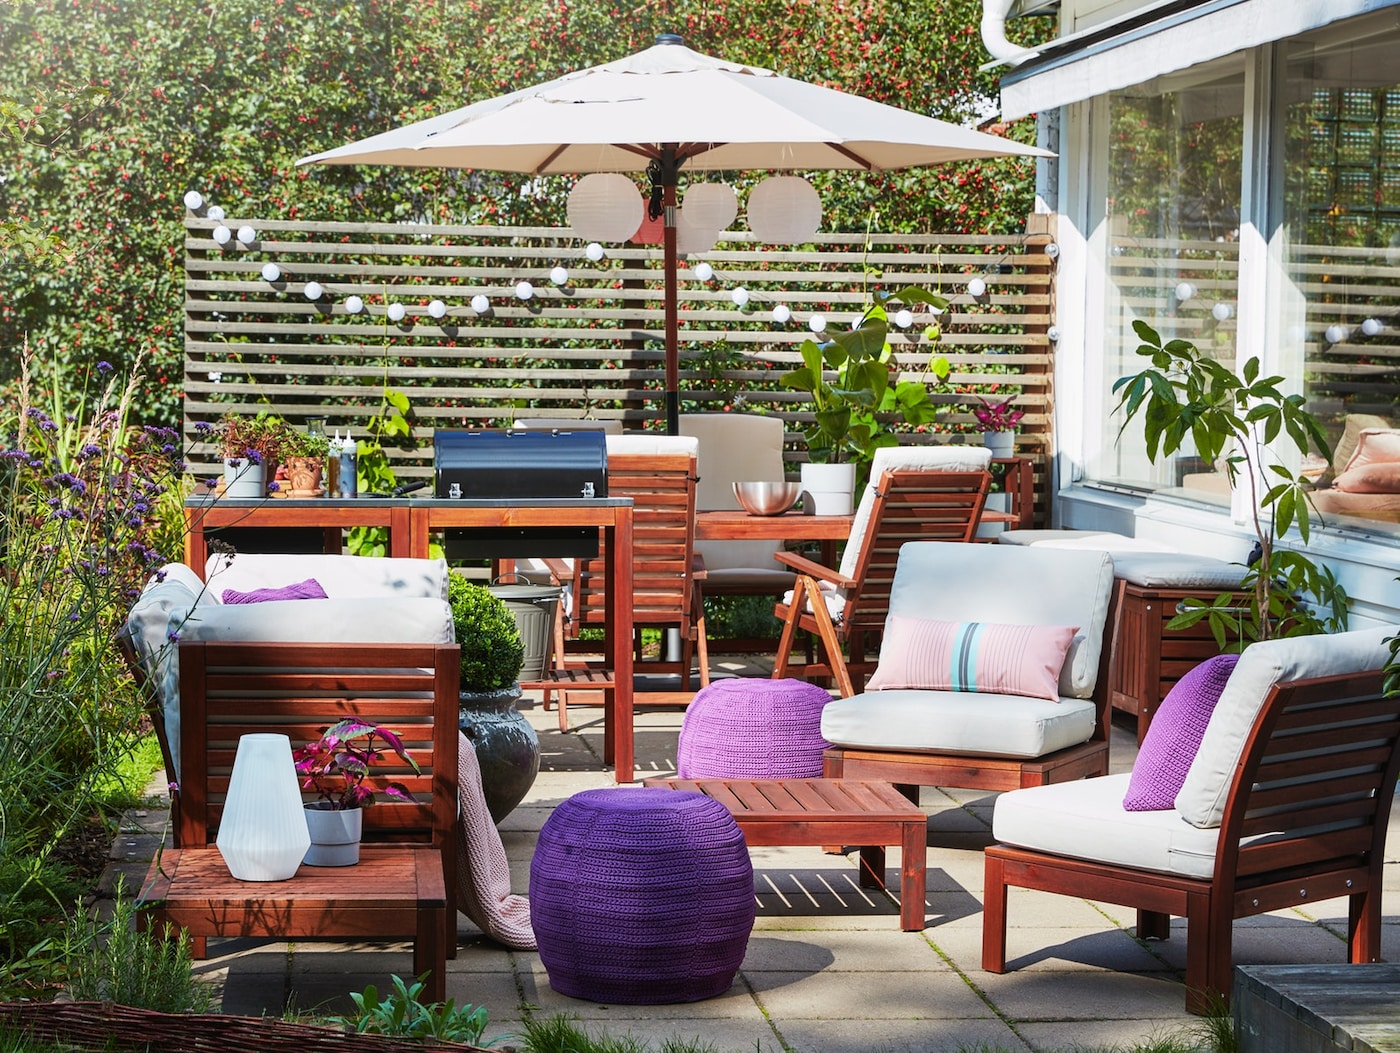 Balkon & Garten: Ideen & Inspirationen - IKEA Deutschland